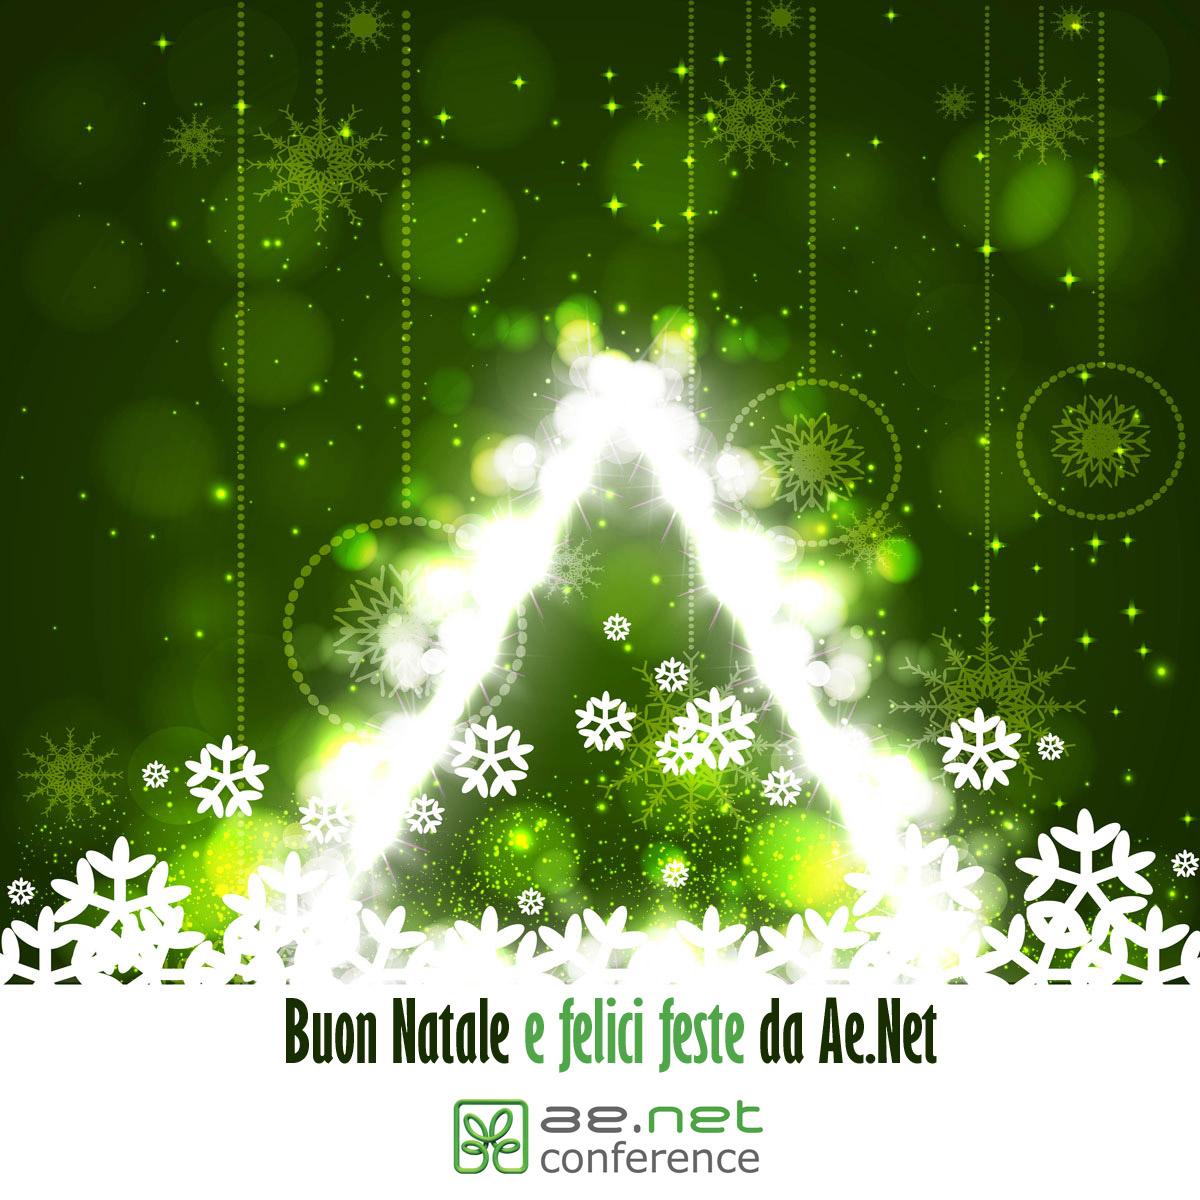 Buon Natale e felici feste da Ae.Net